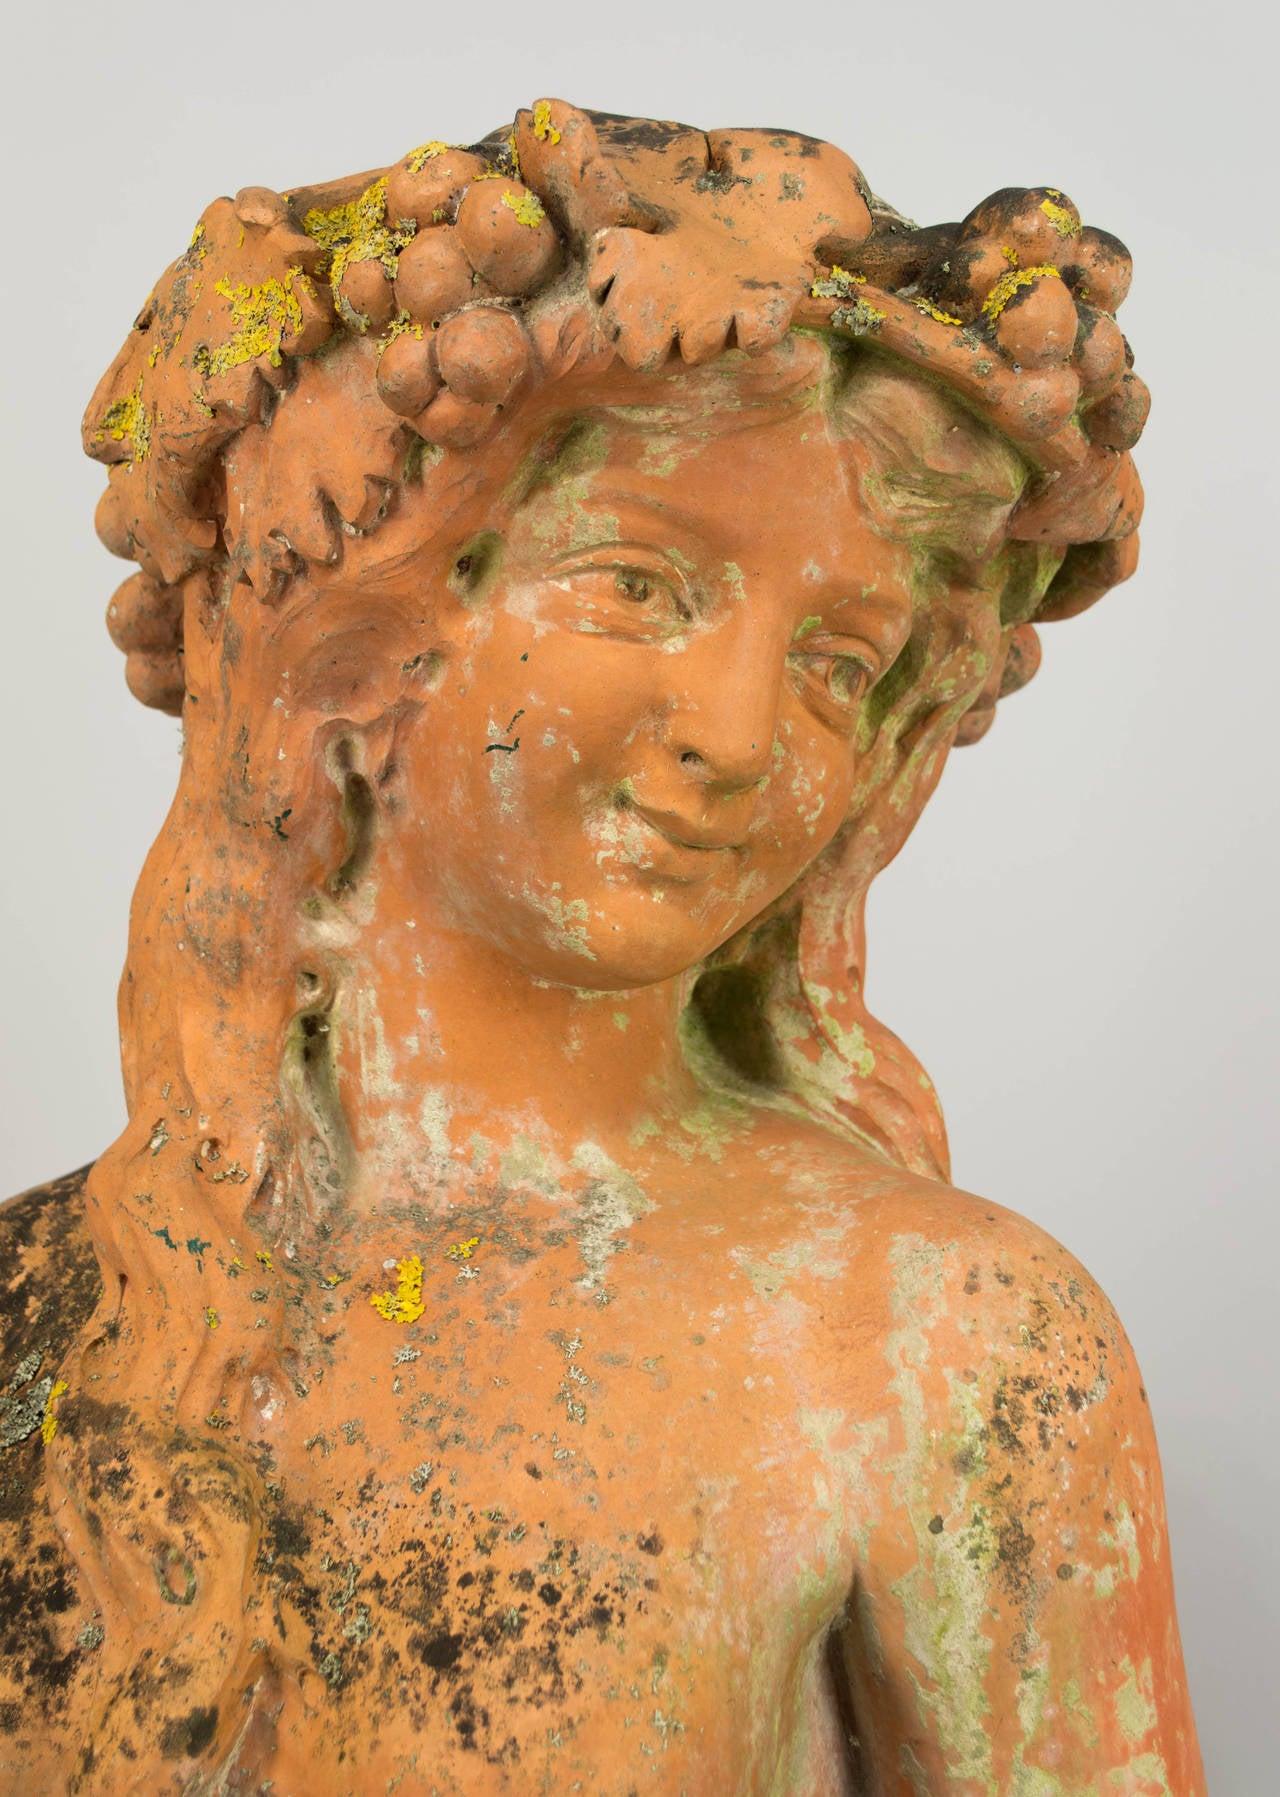 19th Century Italian Terracotta Garden Statue For Sale At 1stdibs